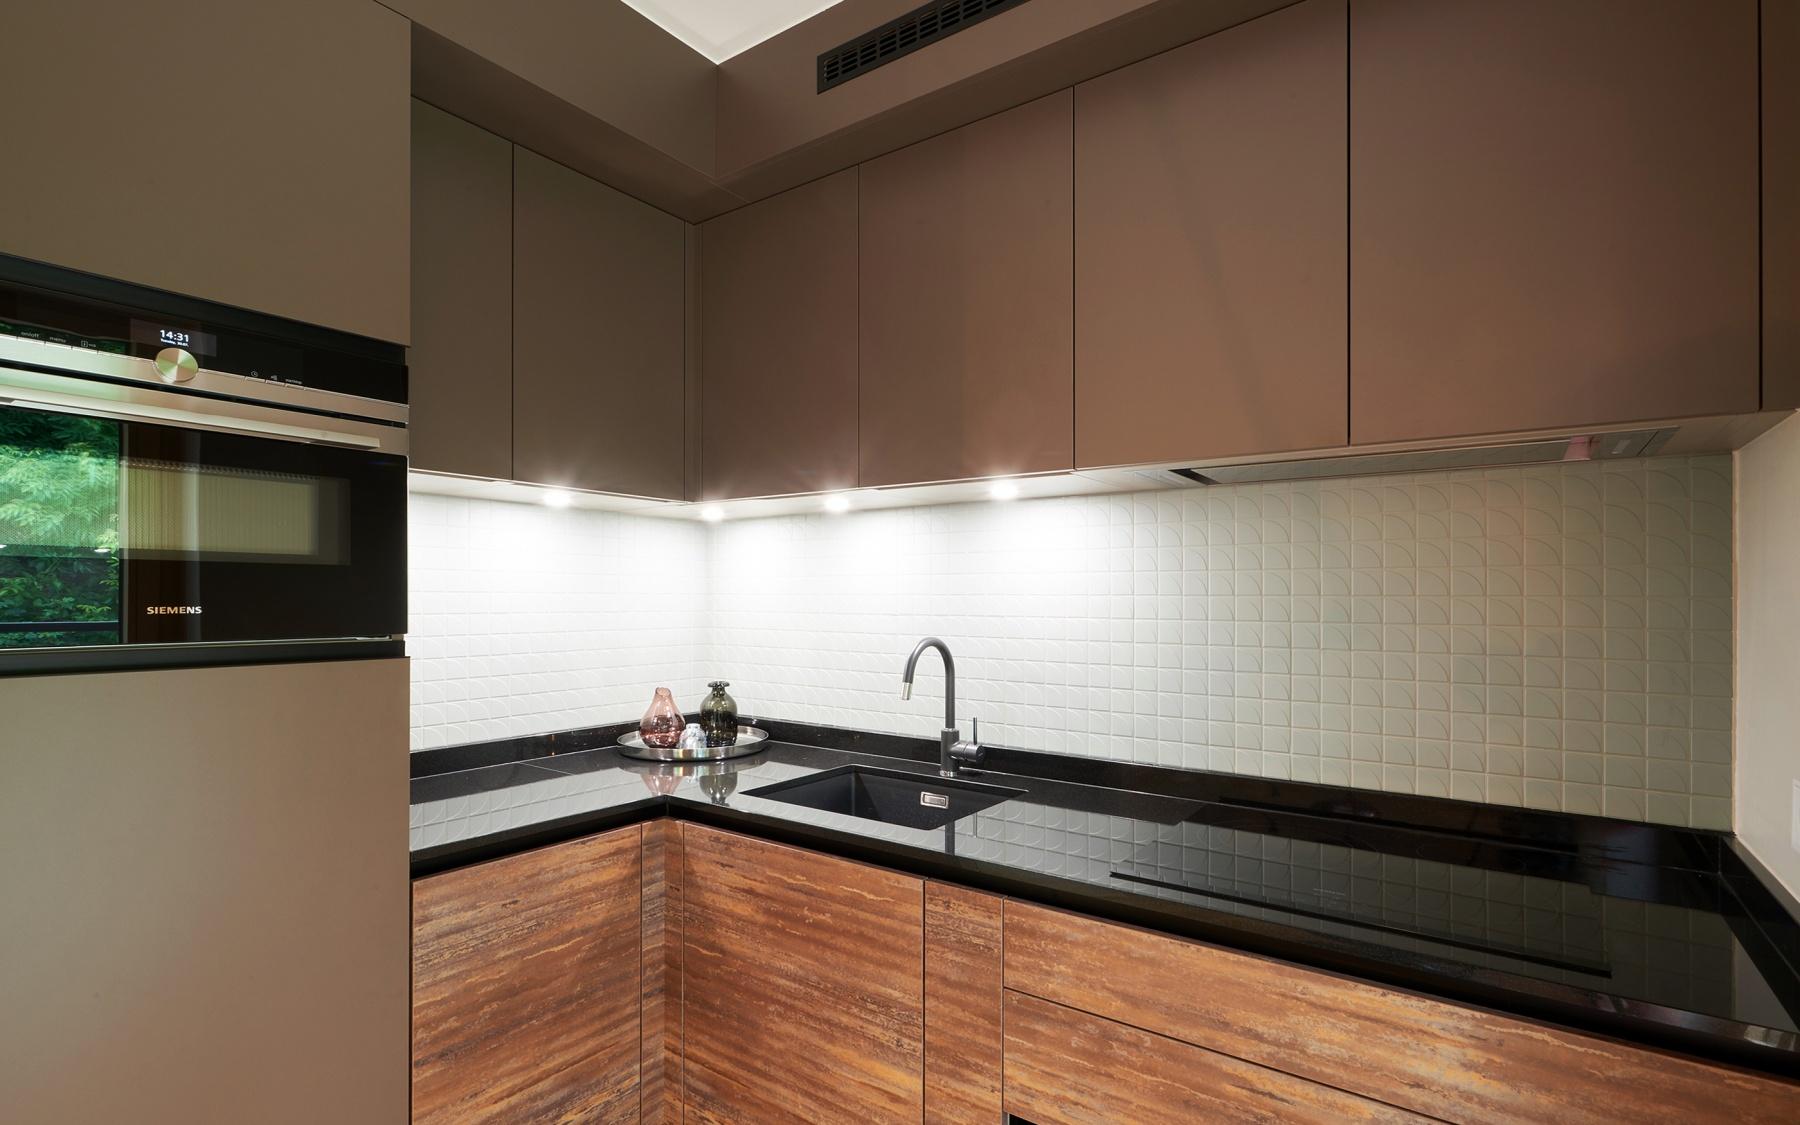 Appartement meublé à Luxembourg-Rollingergrund